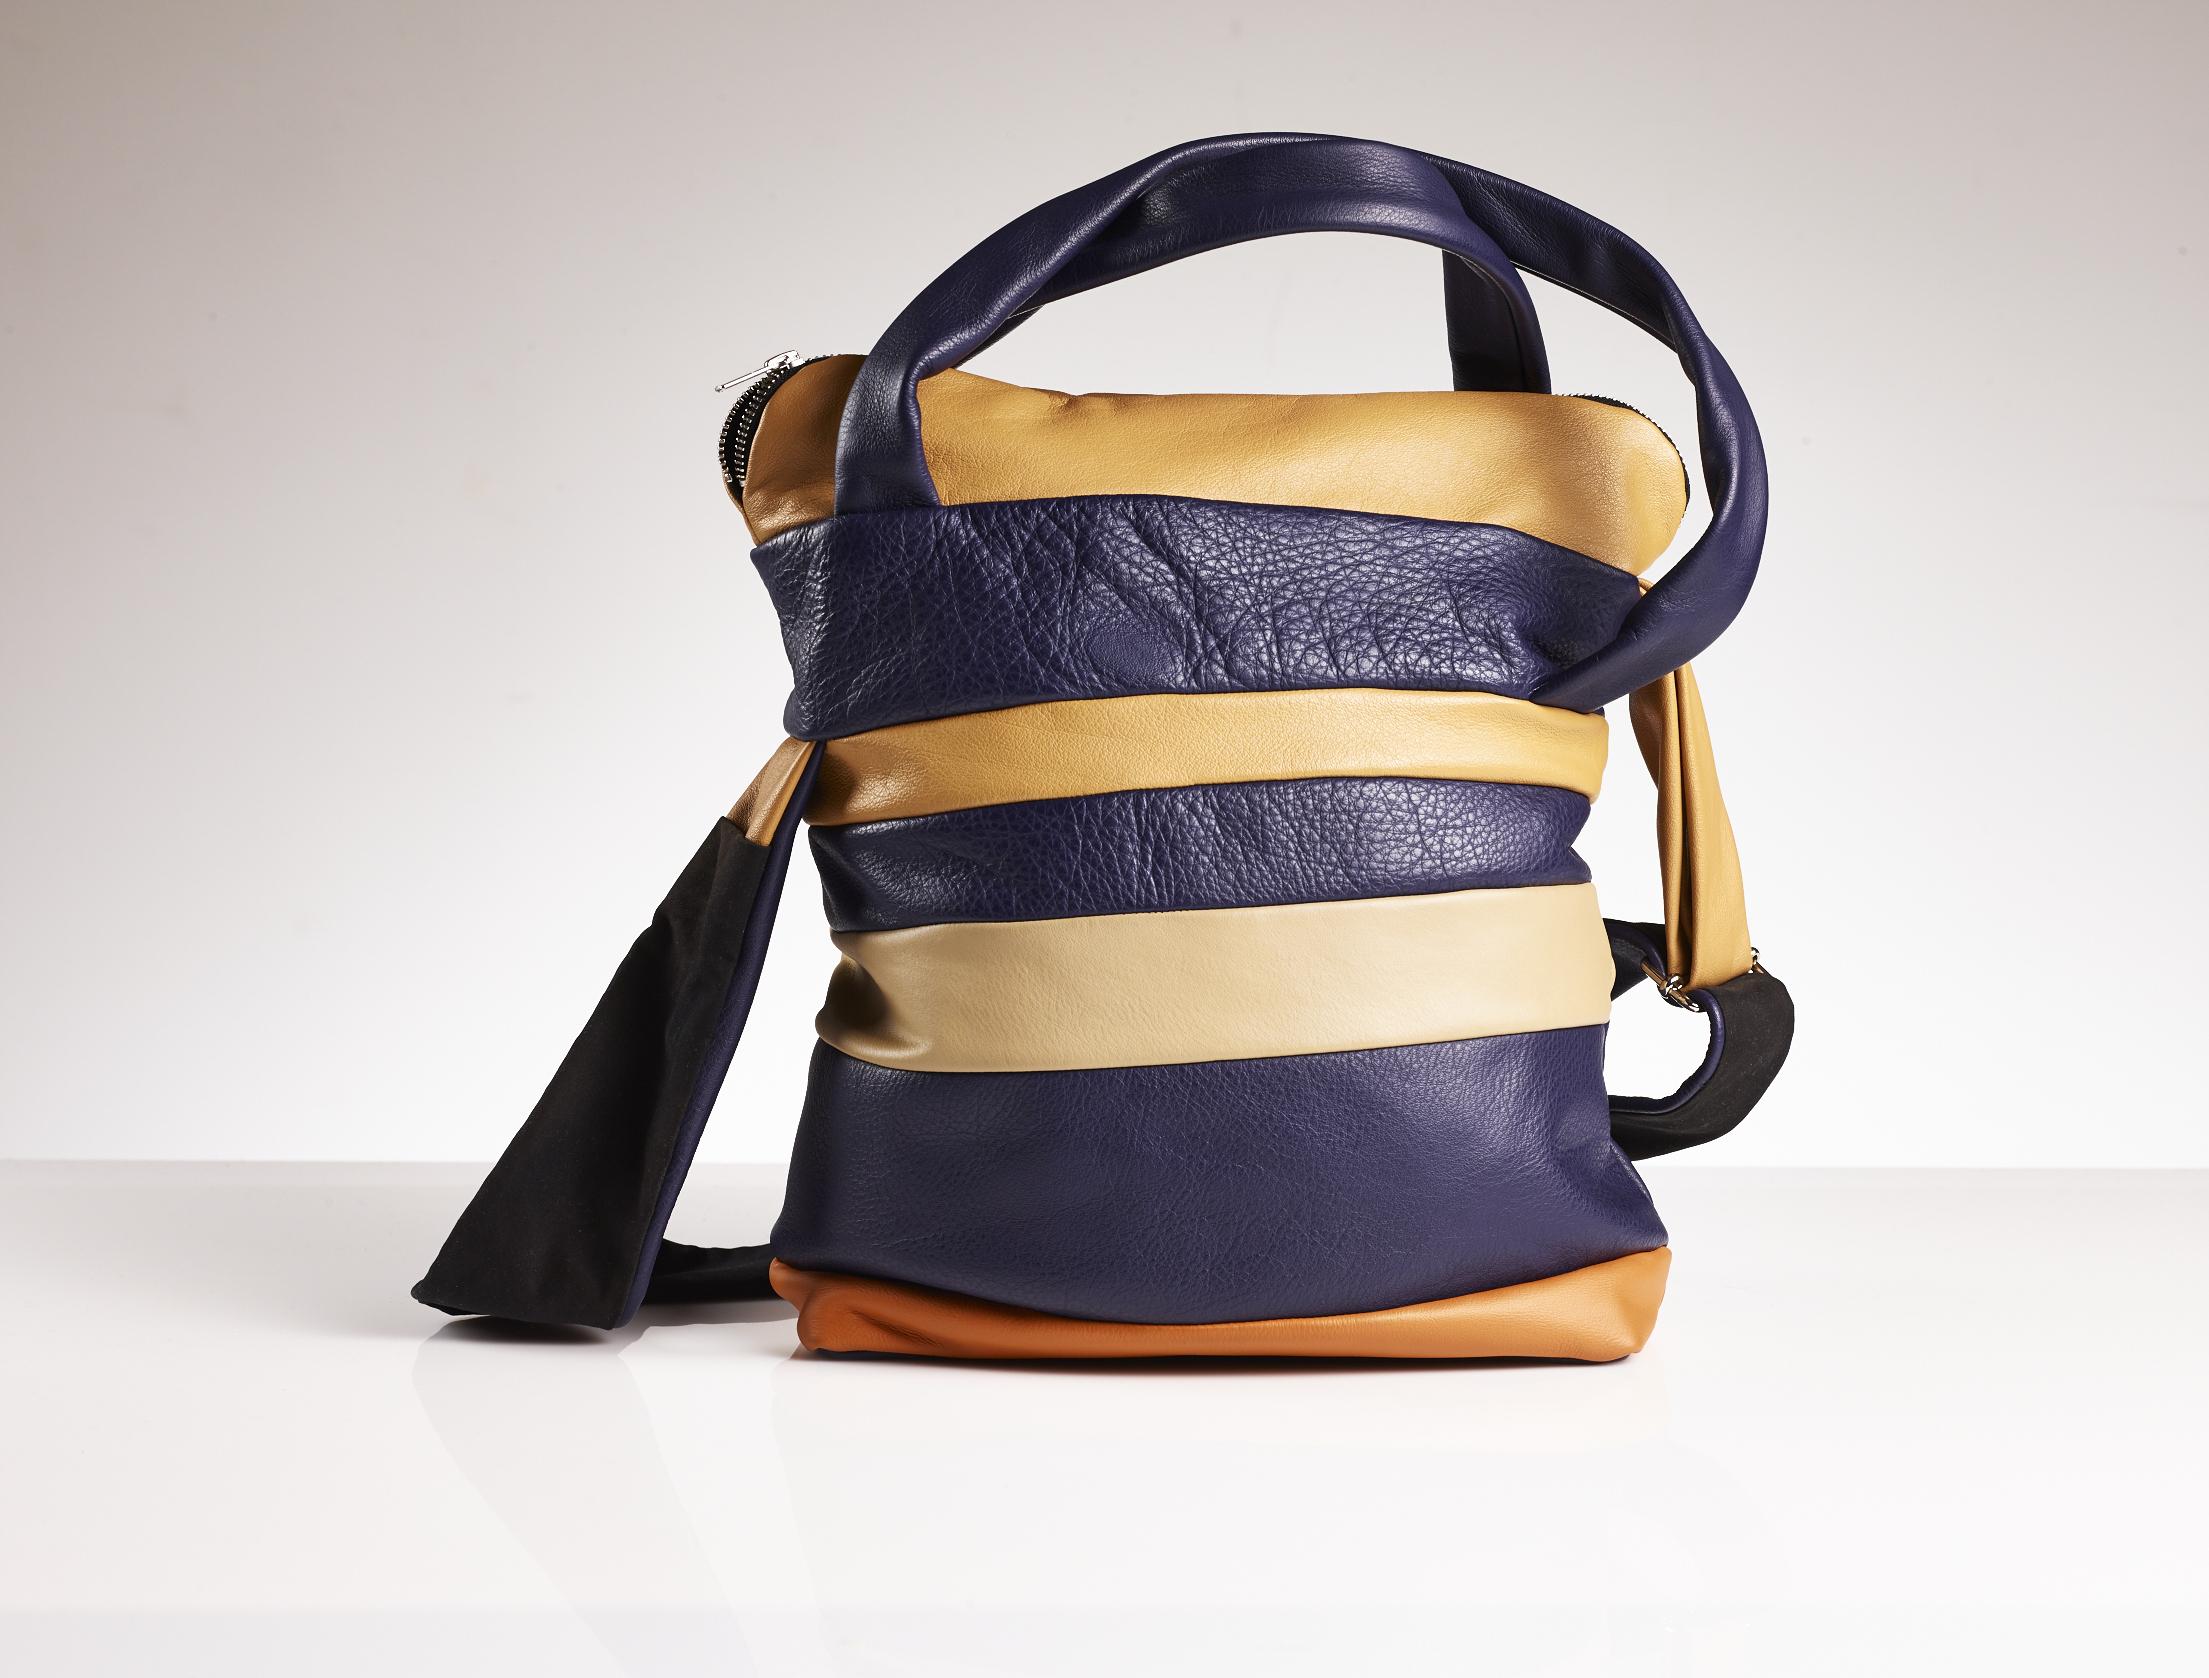 Strehlow handtasche_25987.jpg